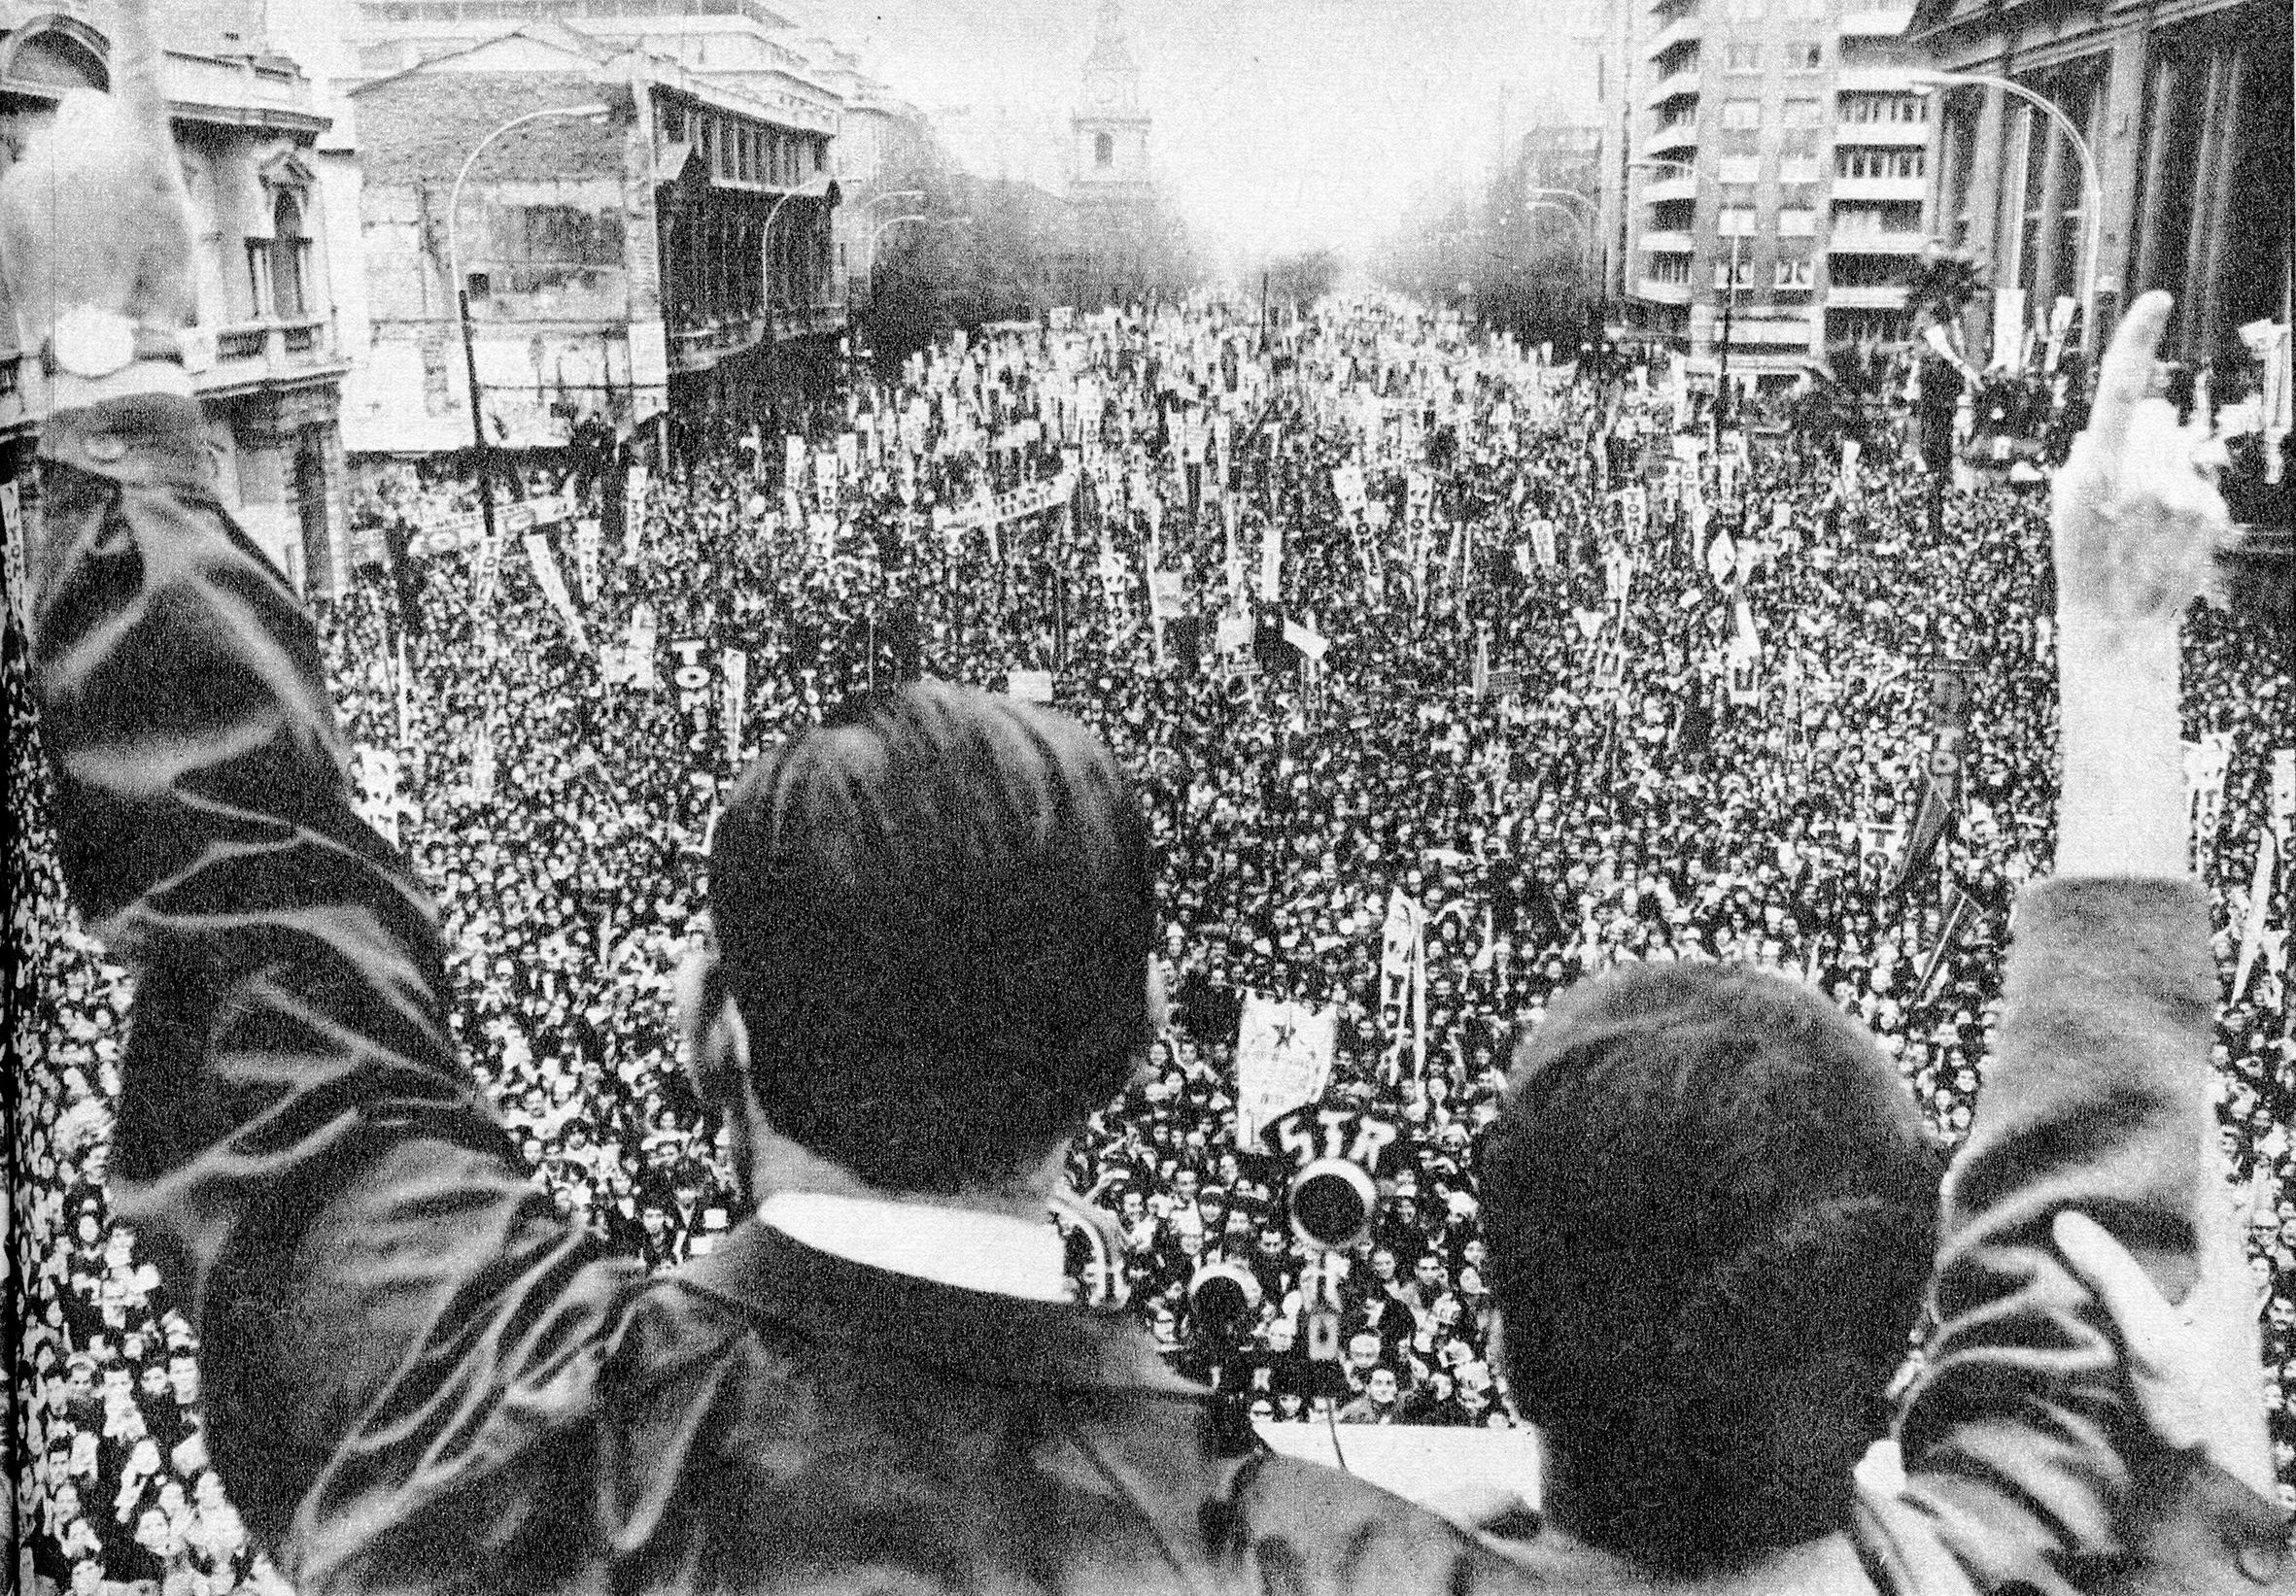 Enterreno - Fotos históricas de chile - fotos antiguas de Chile - Triunfo de Allende, 1970